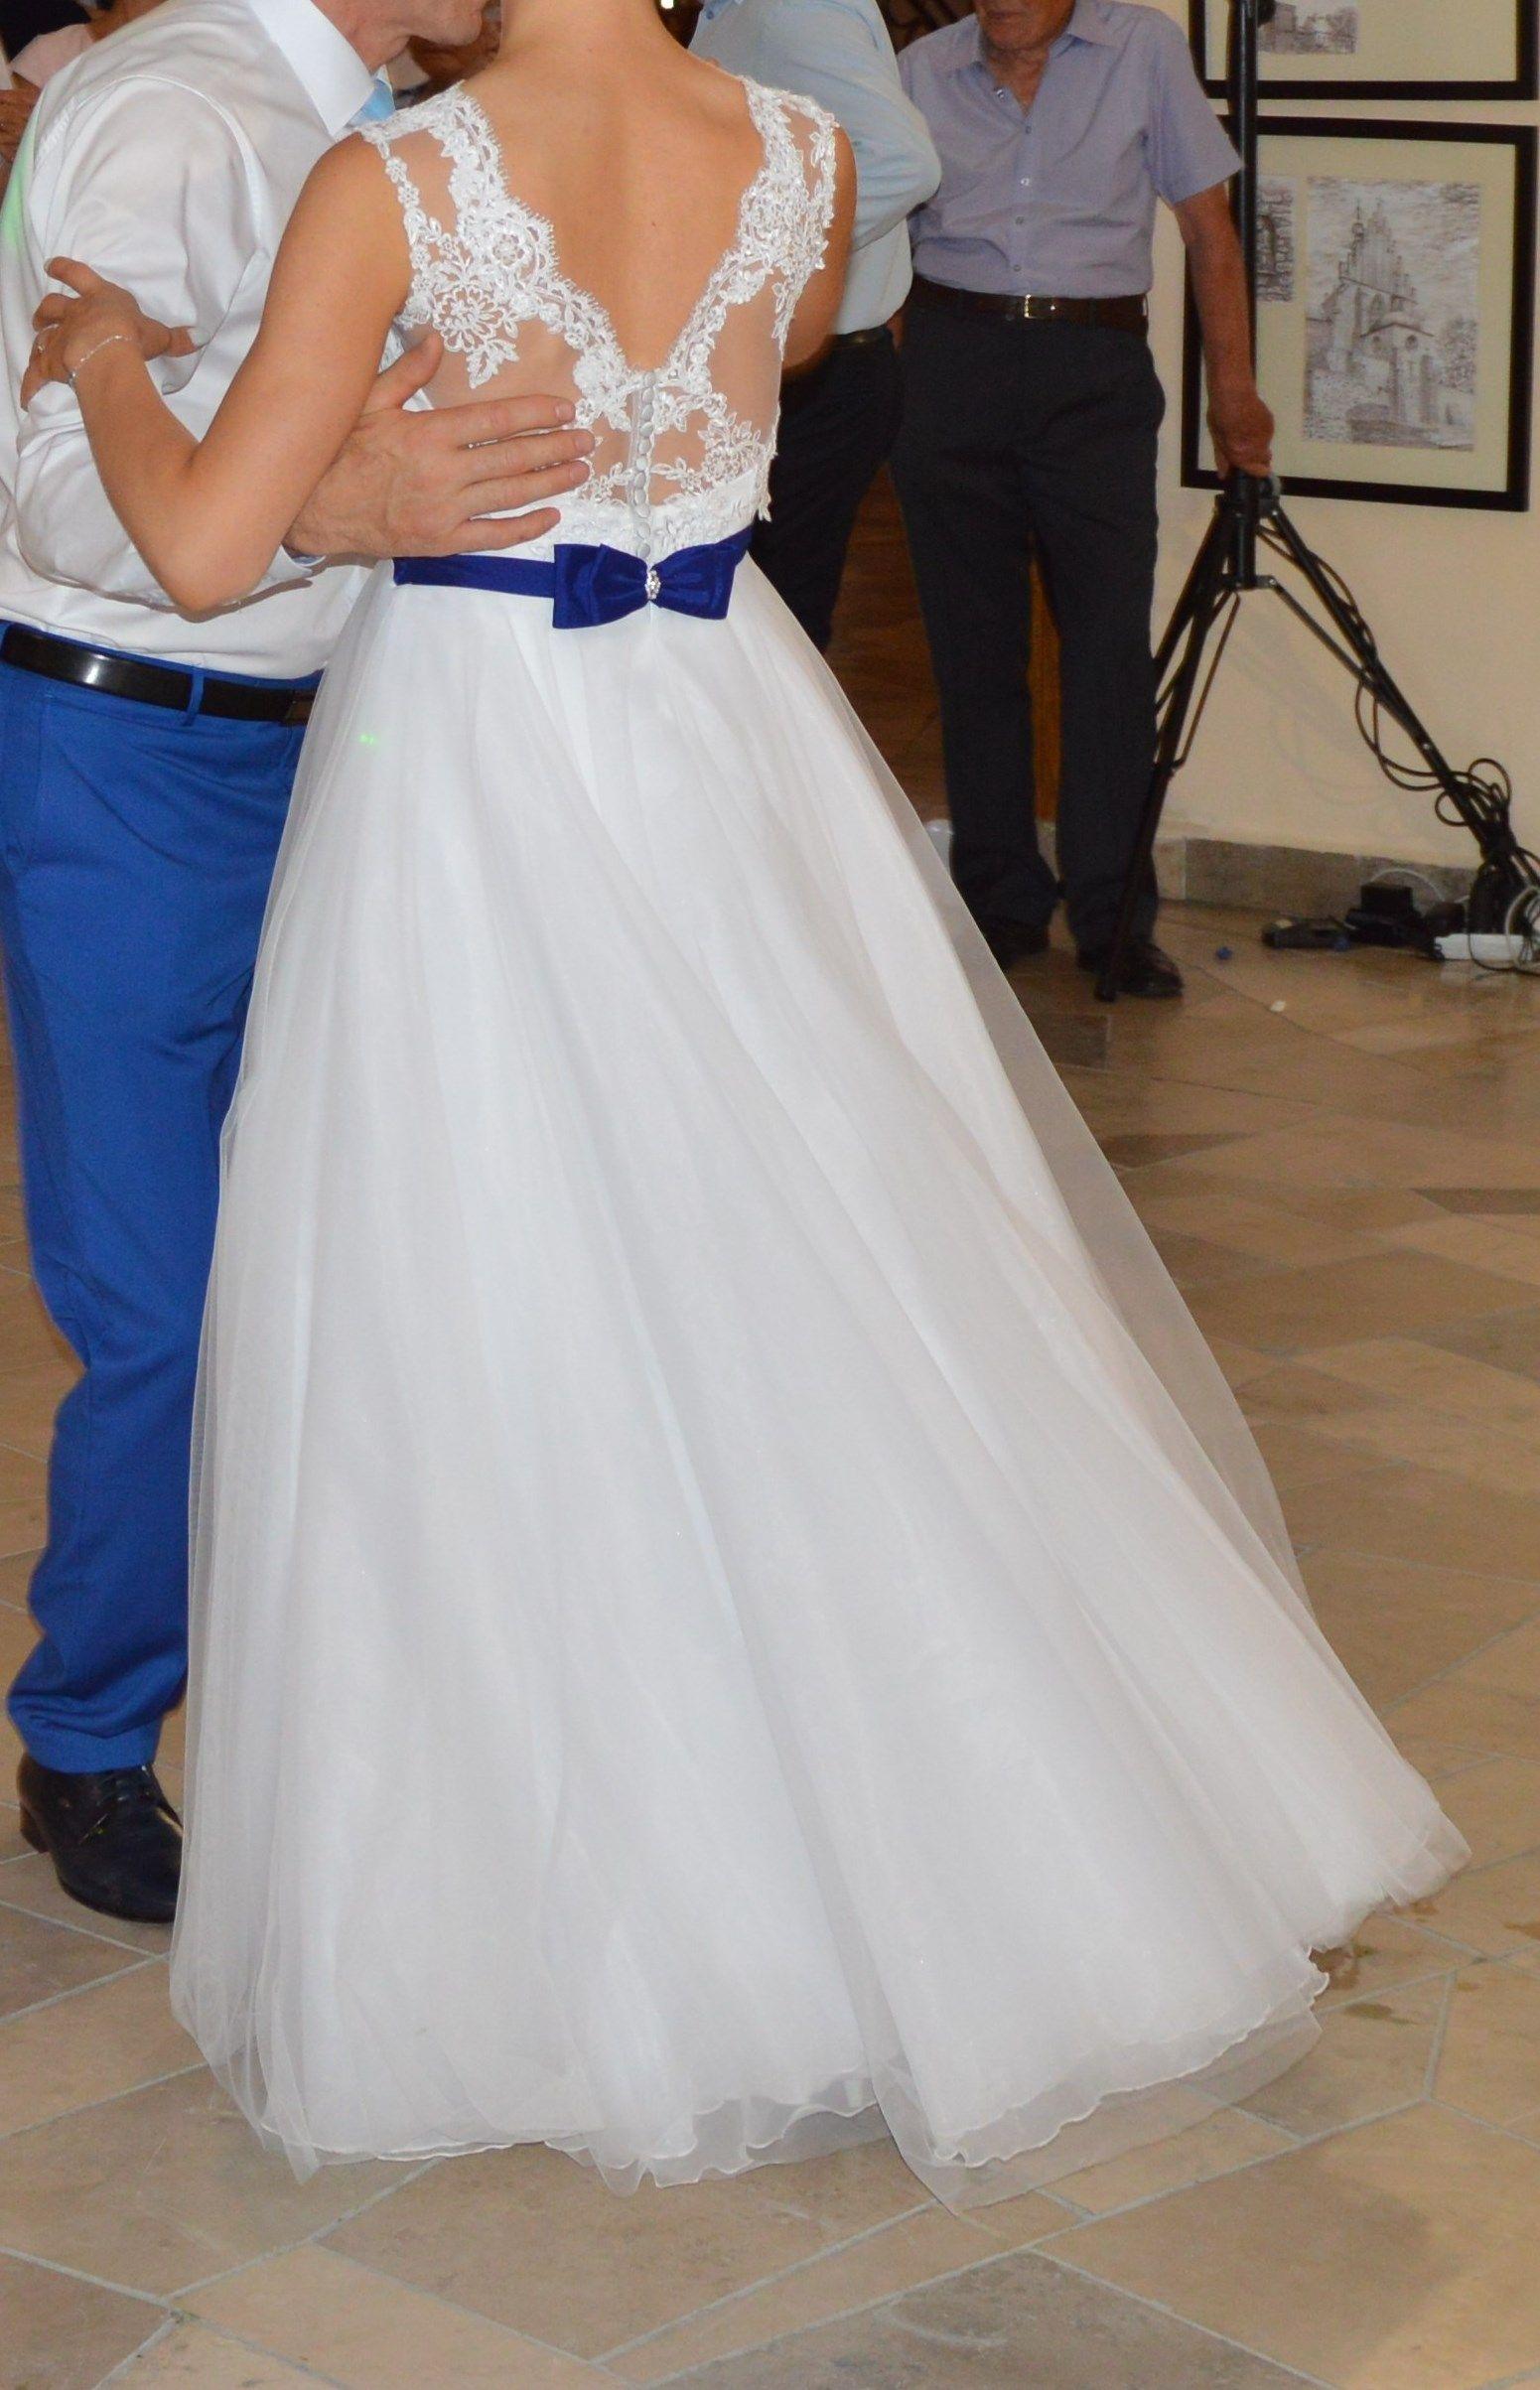 Suknia Slubna 2 W 1 Koronkowa Krotka I Dluga Z Gra 6807768004 Oficjalne Archiwum Allegro Formal Dresses Dresses Fashion